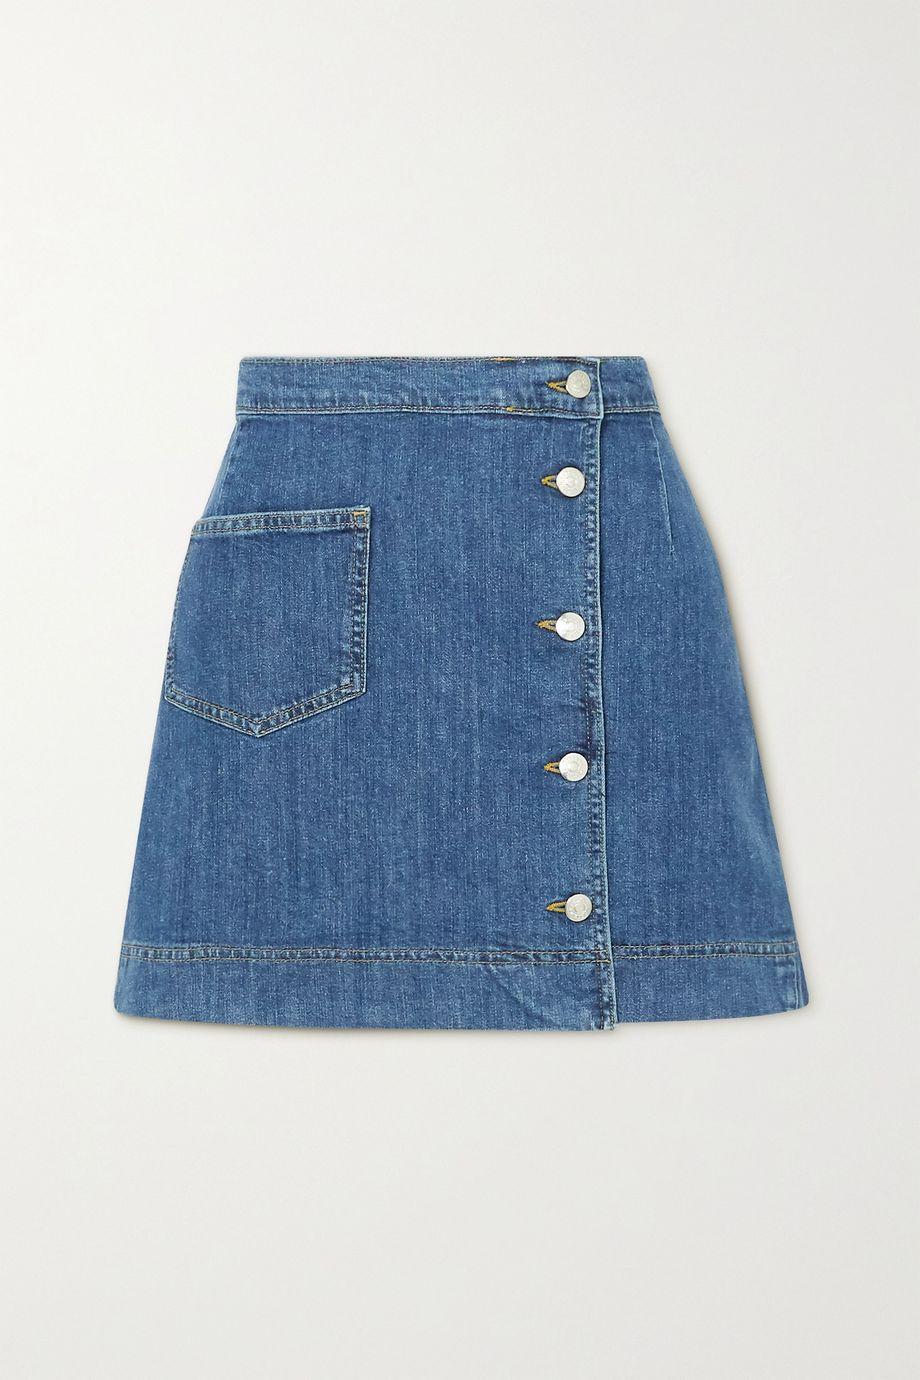 ALEXACHUNG 1976 牛仔布裹身迷你半身裙